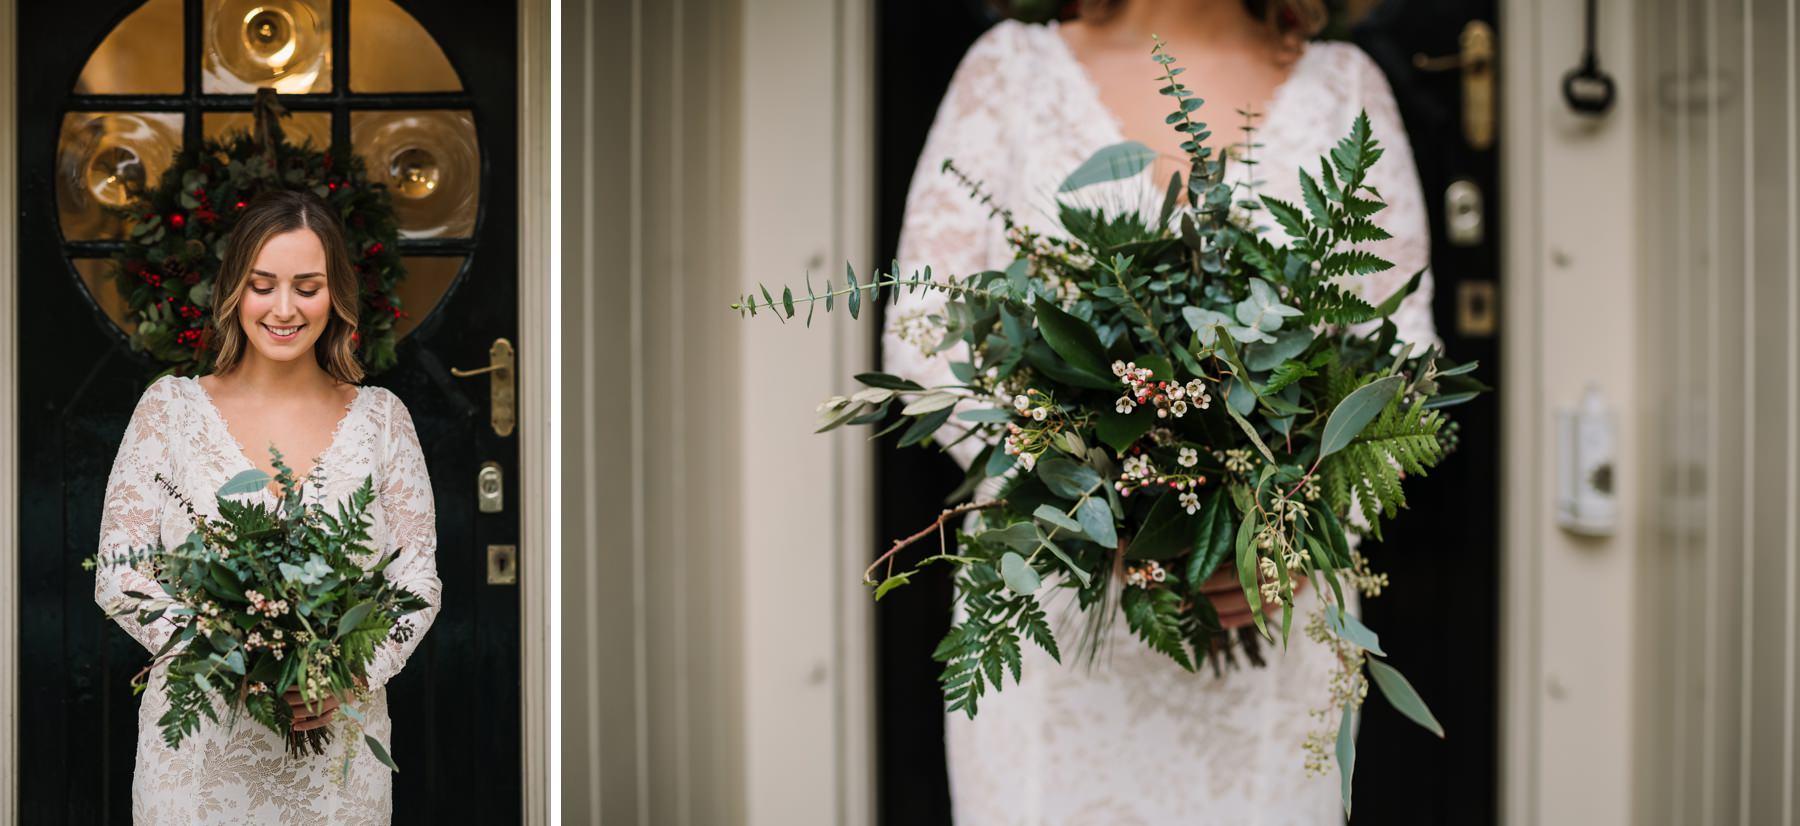 Bride with foliage bouquet by Corbins Florist in Brockenhurst